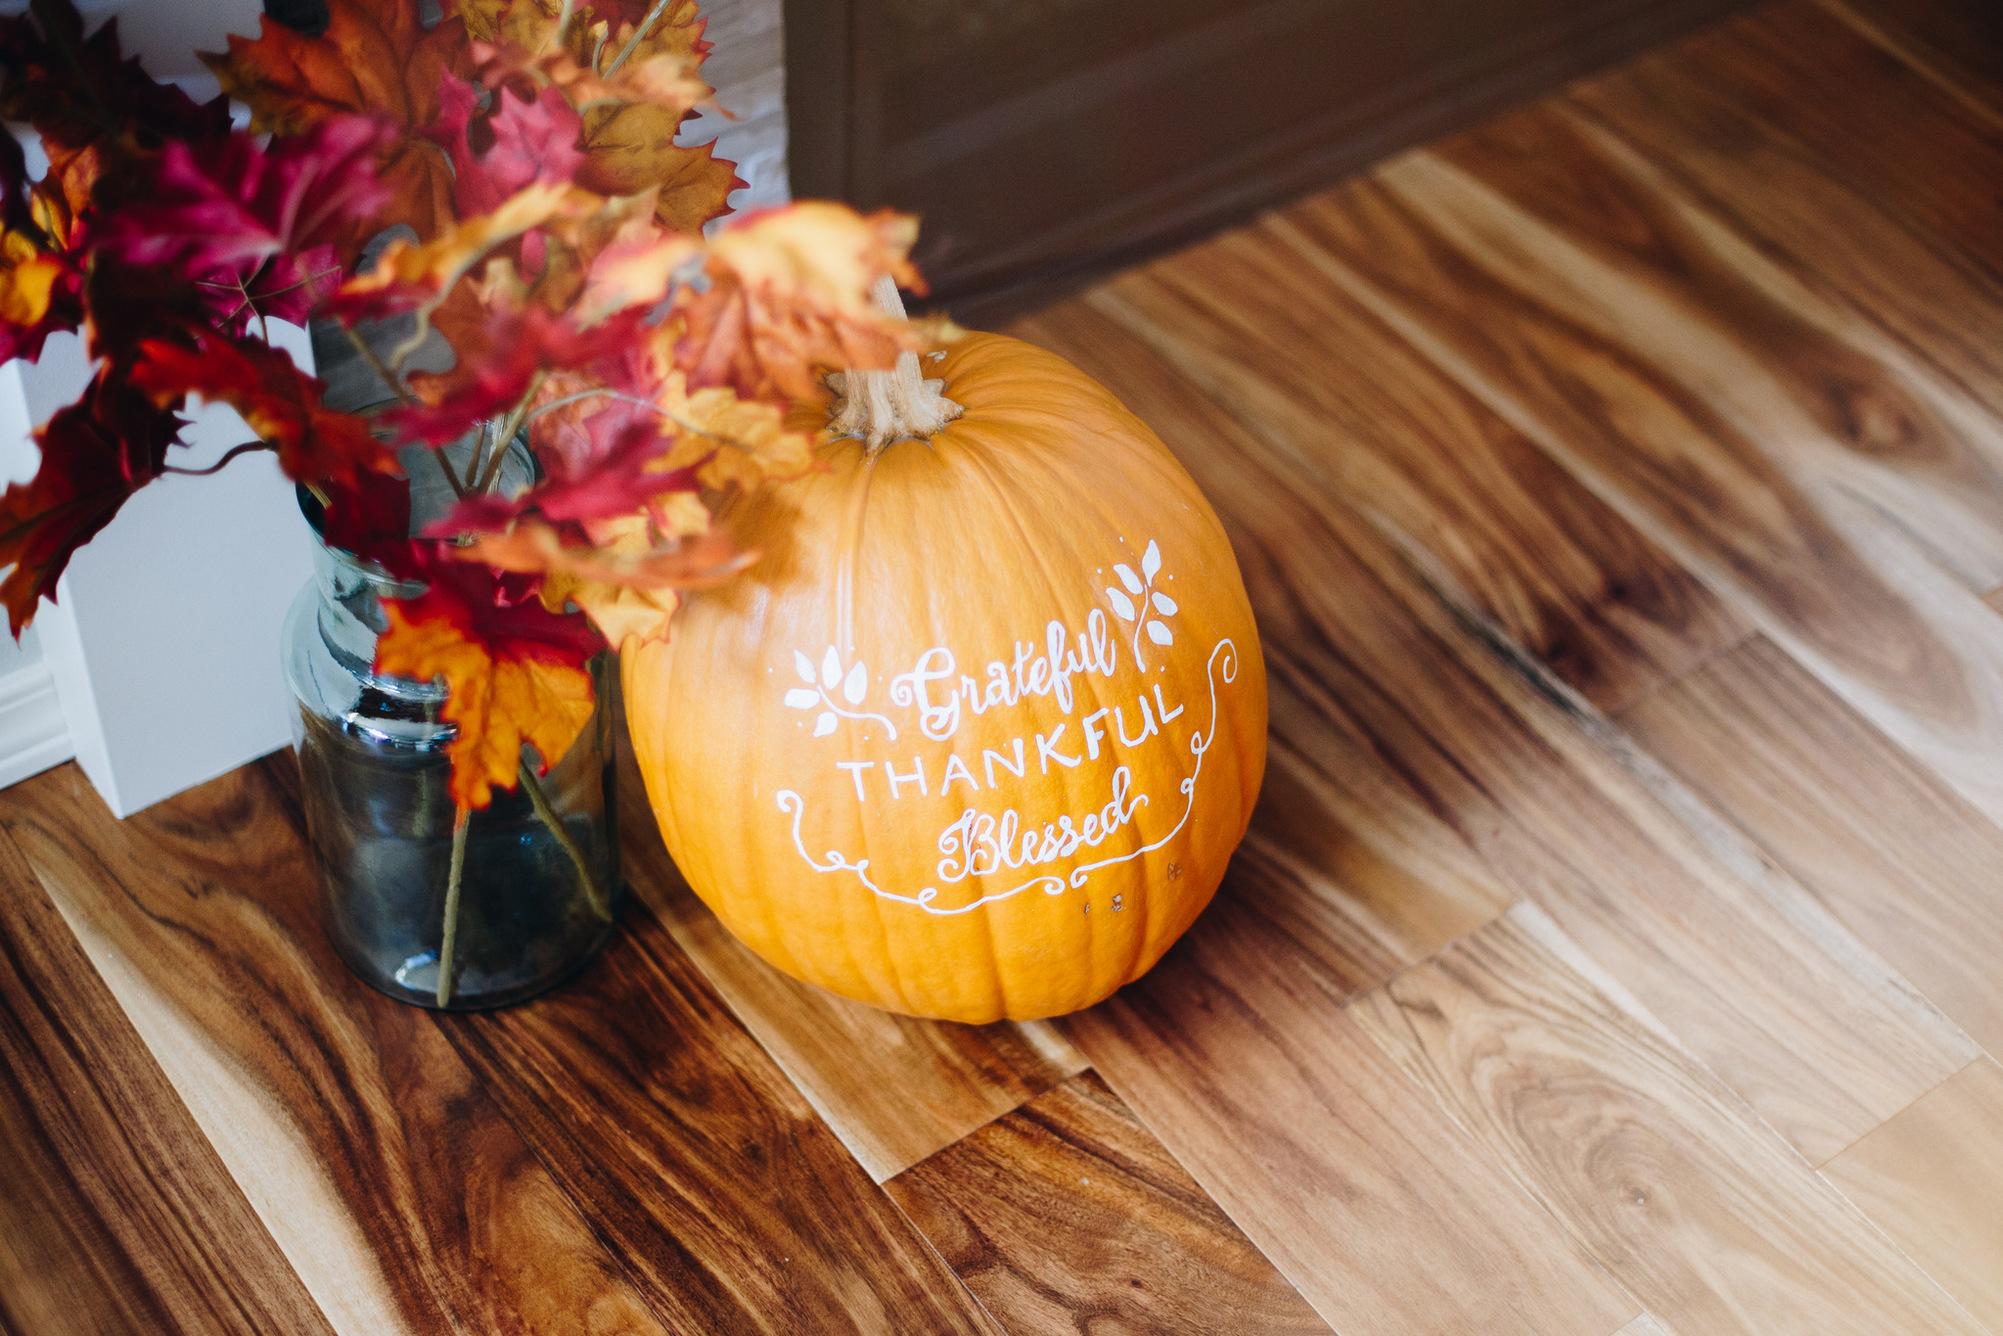 grateful thankful blessed - lettering on pumpkin